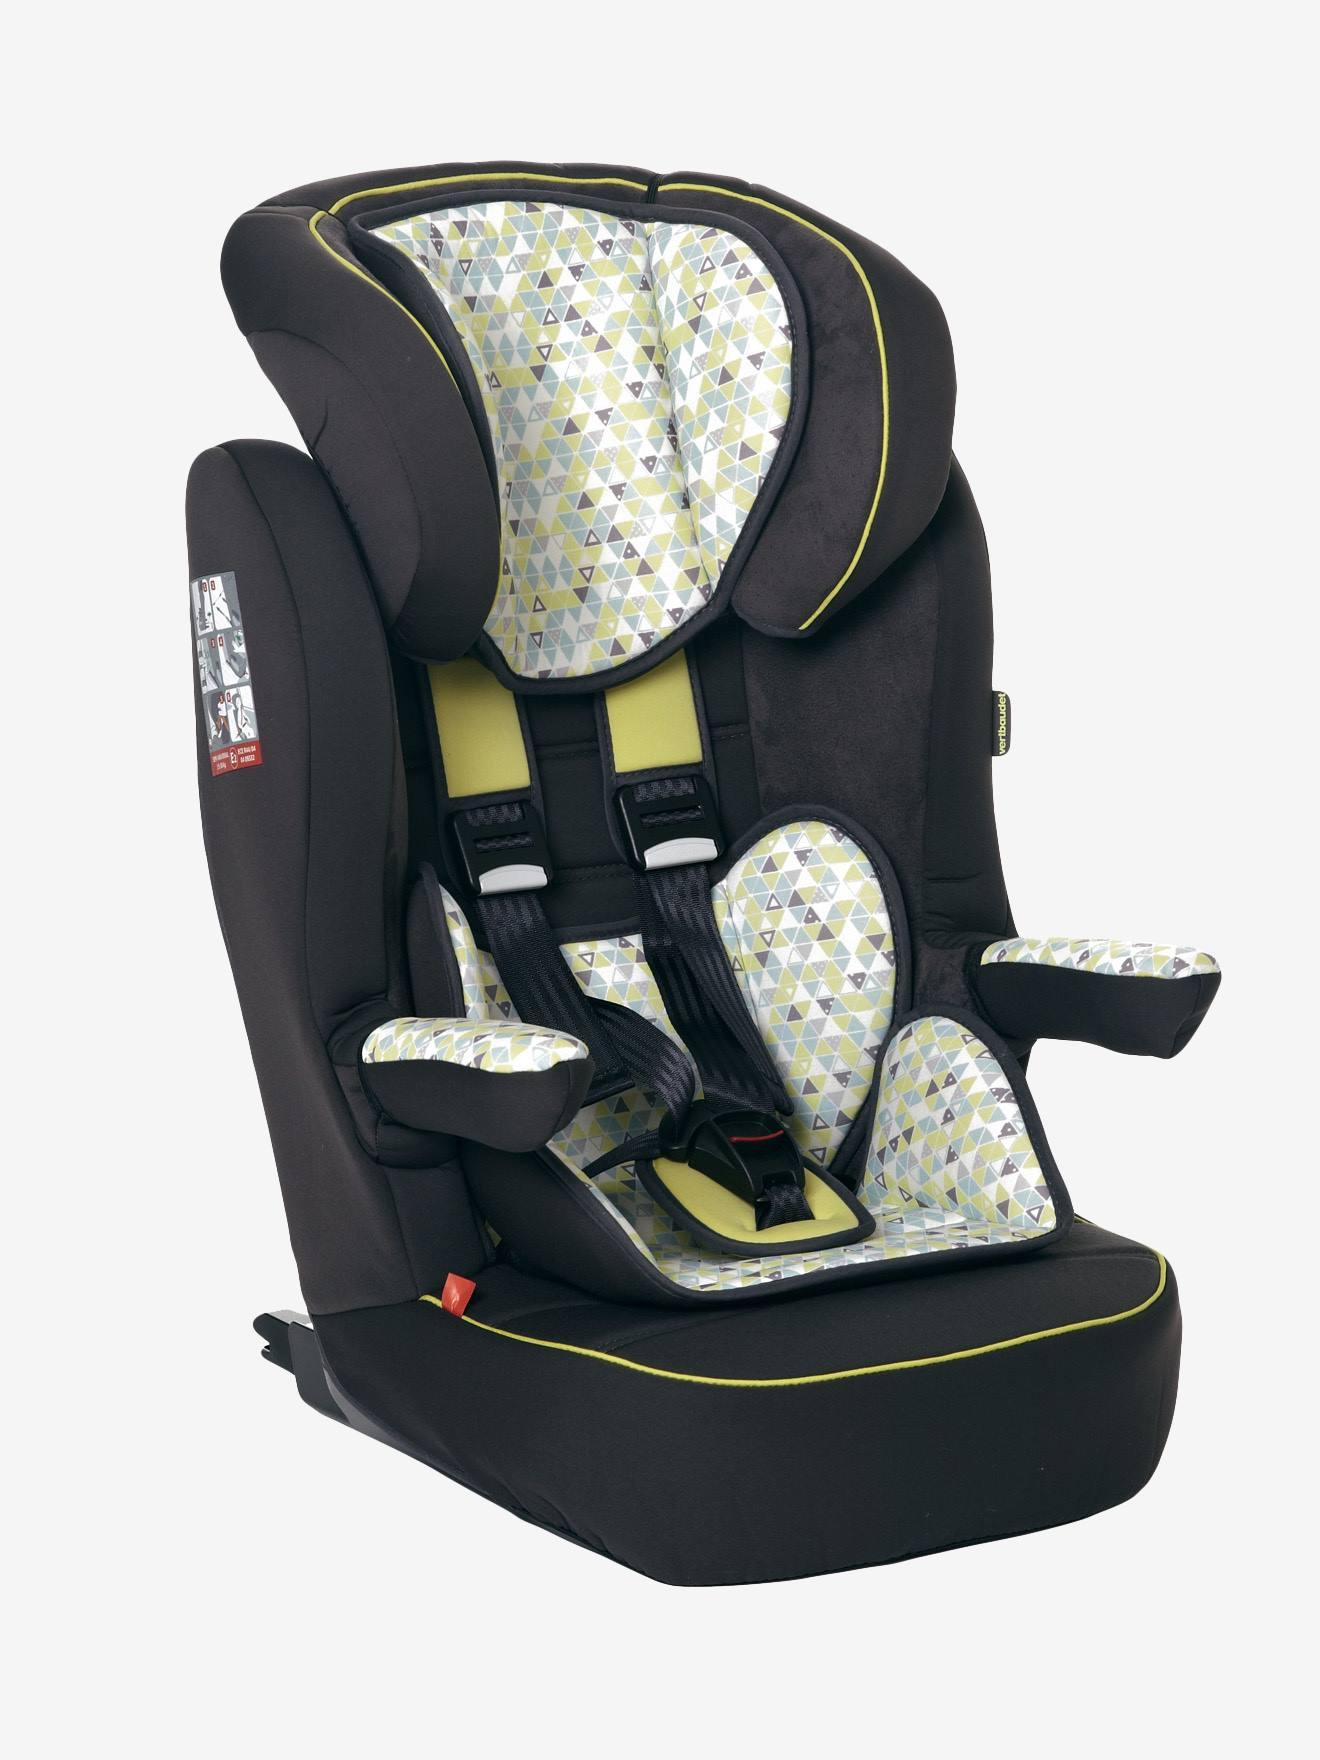 Vertbaudet Kindersitz ´´Kidsit+ Isofix´´ Gr. 1/...